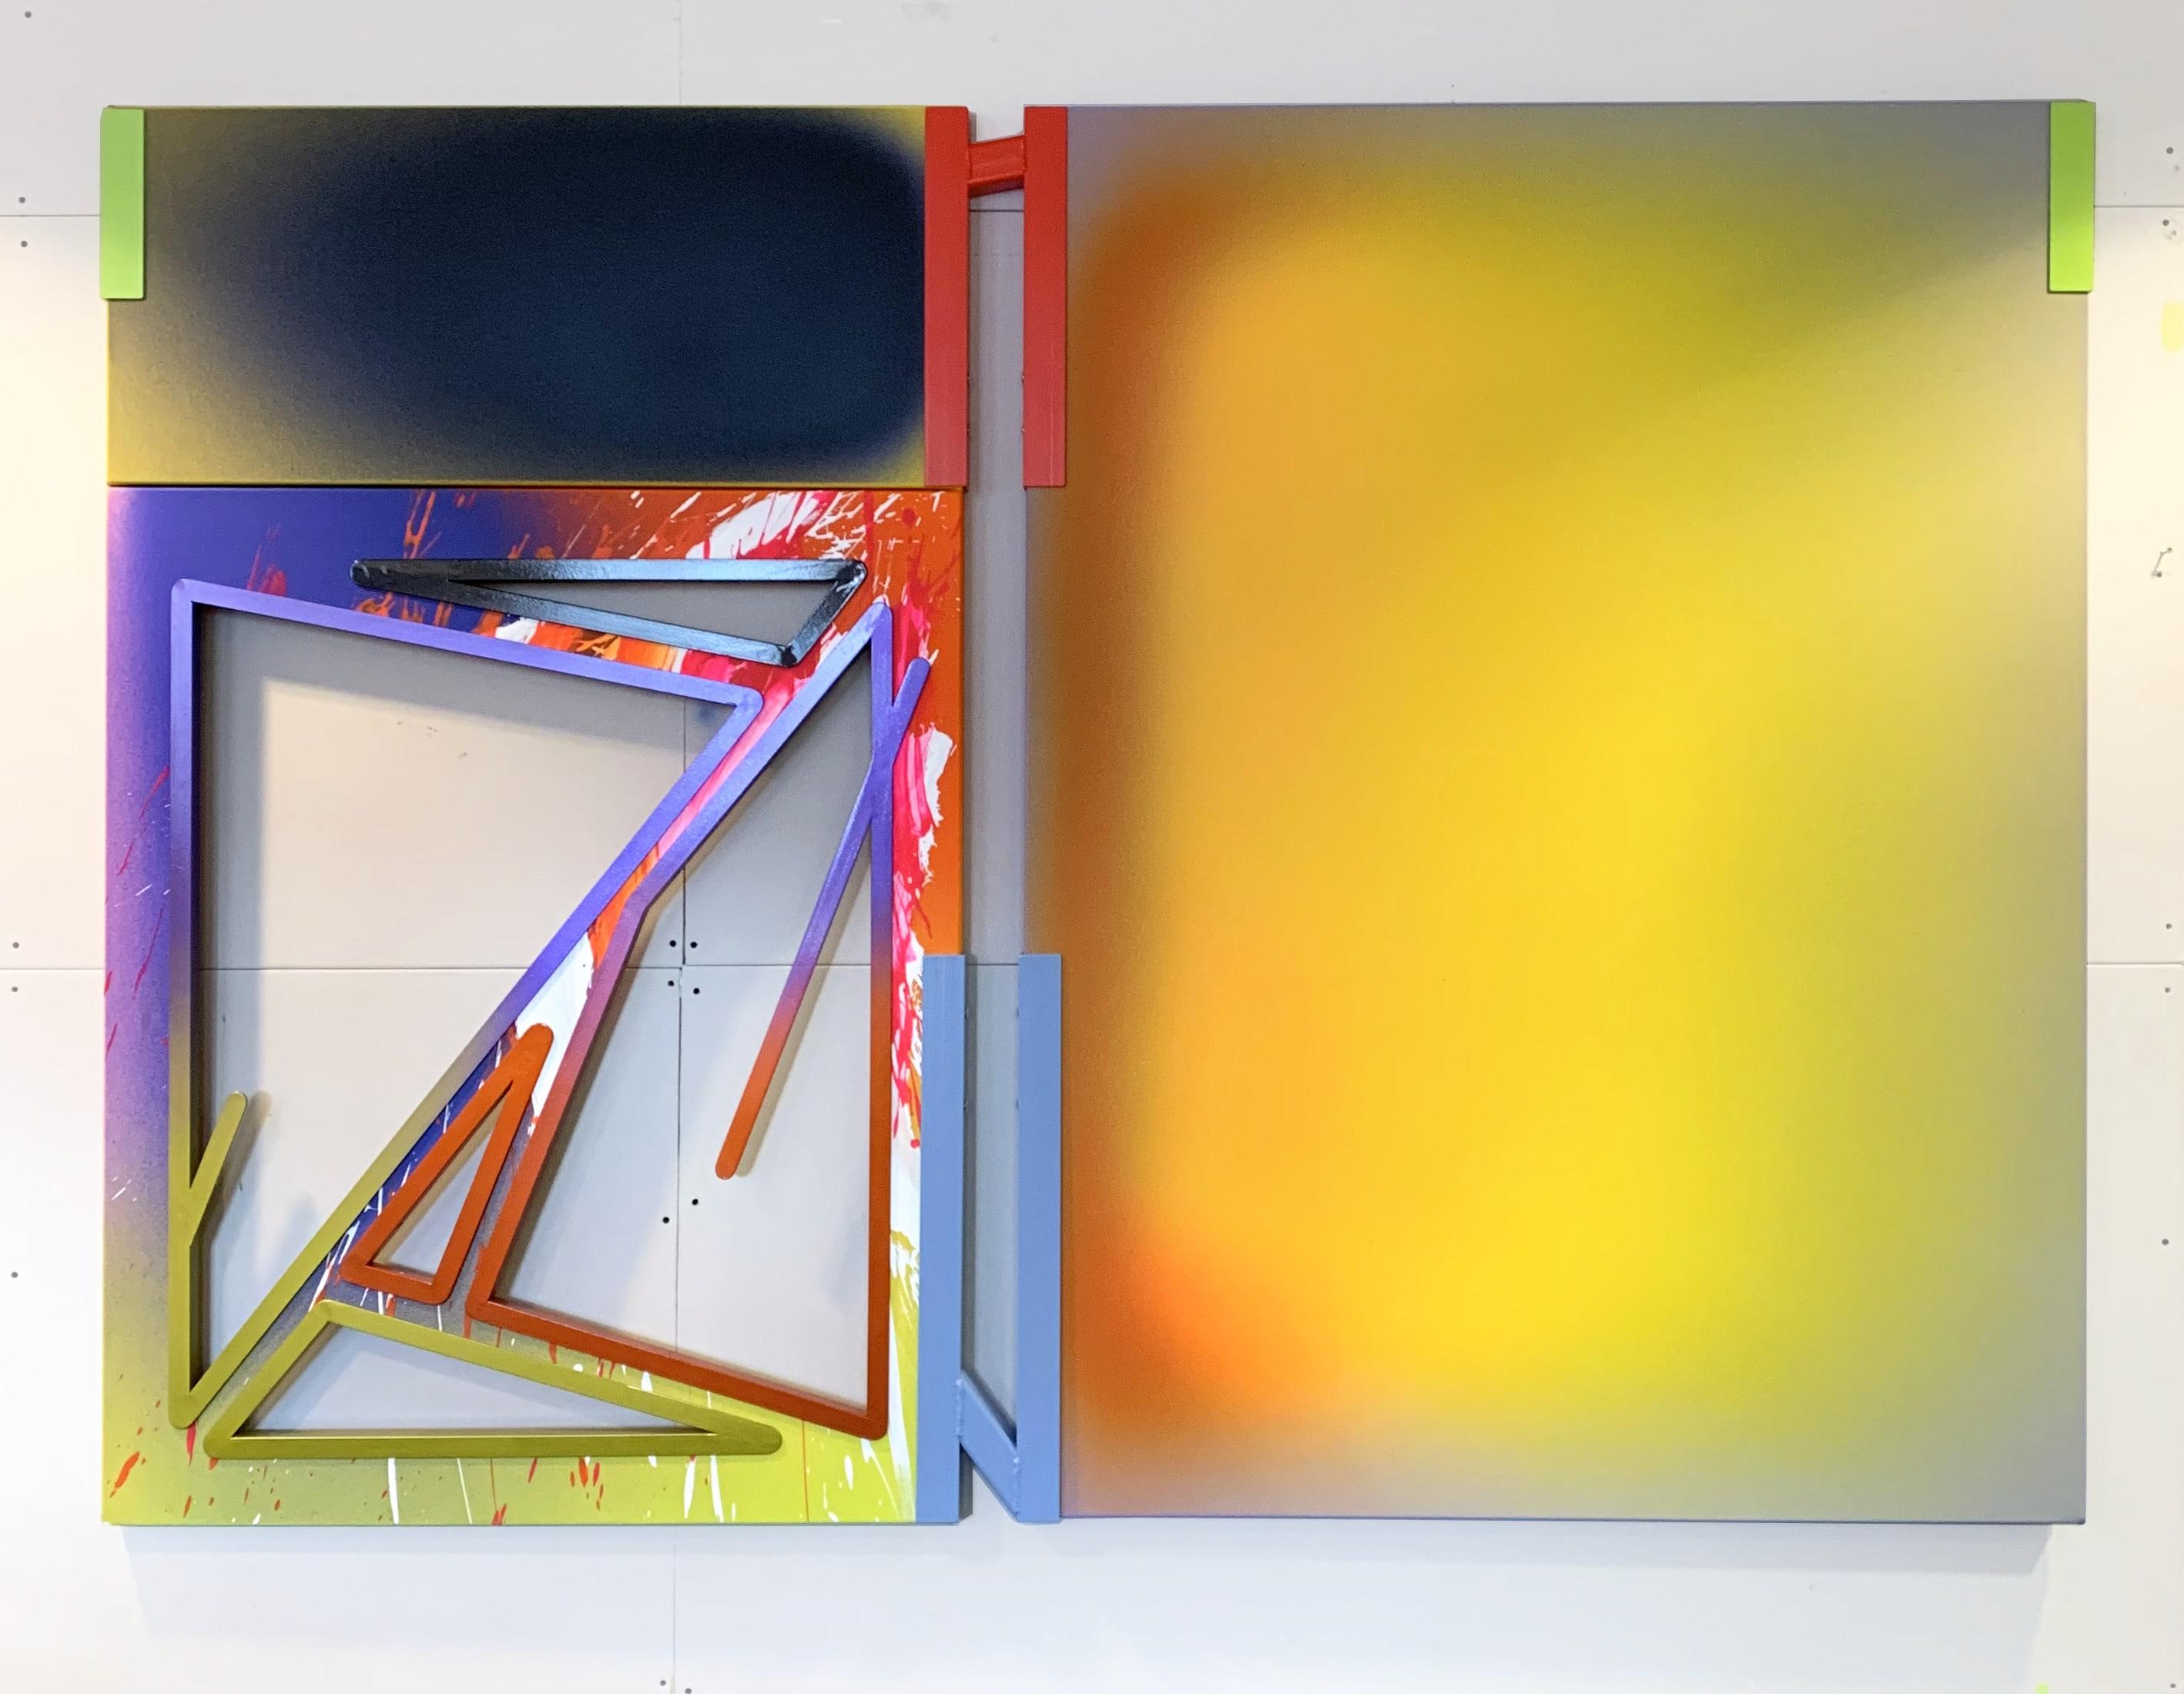 NemesM_The-Better-Self-06_2020_232x165cm_acrylic-carpaint-canvas-steel-powoodwder-coated-steel-wood-min